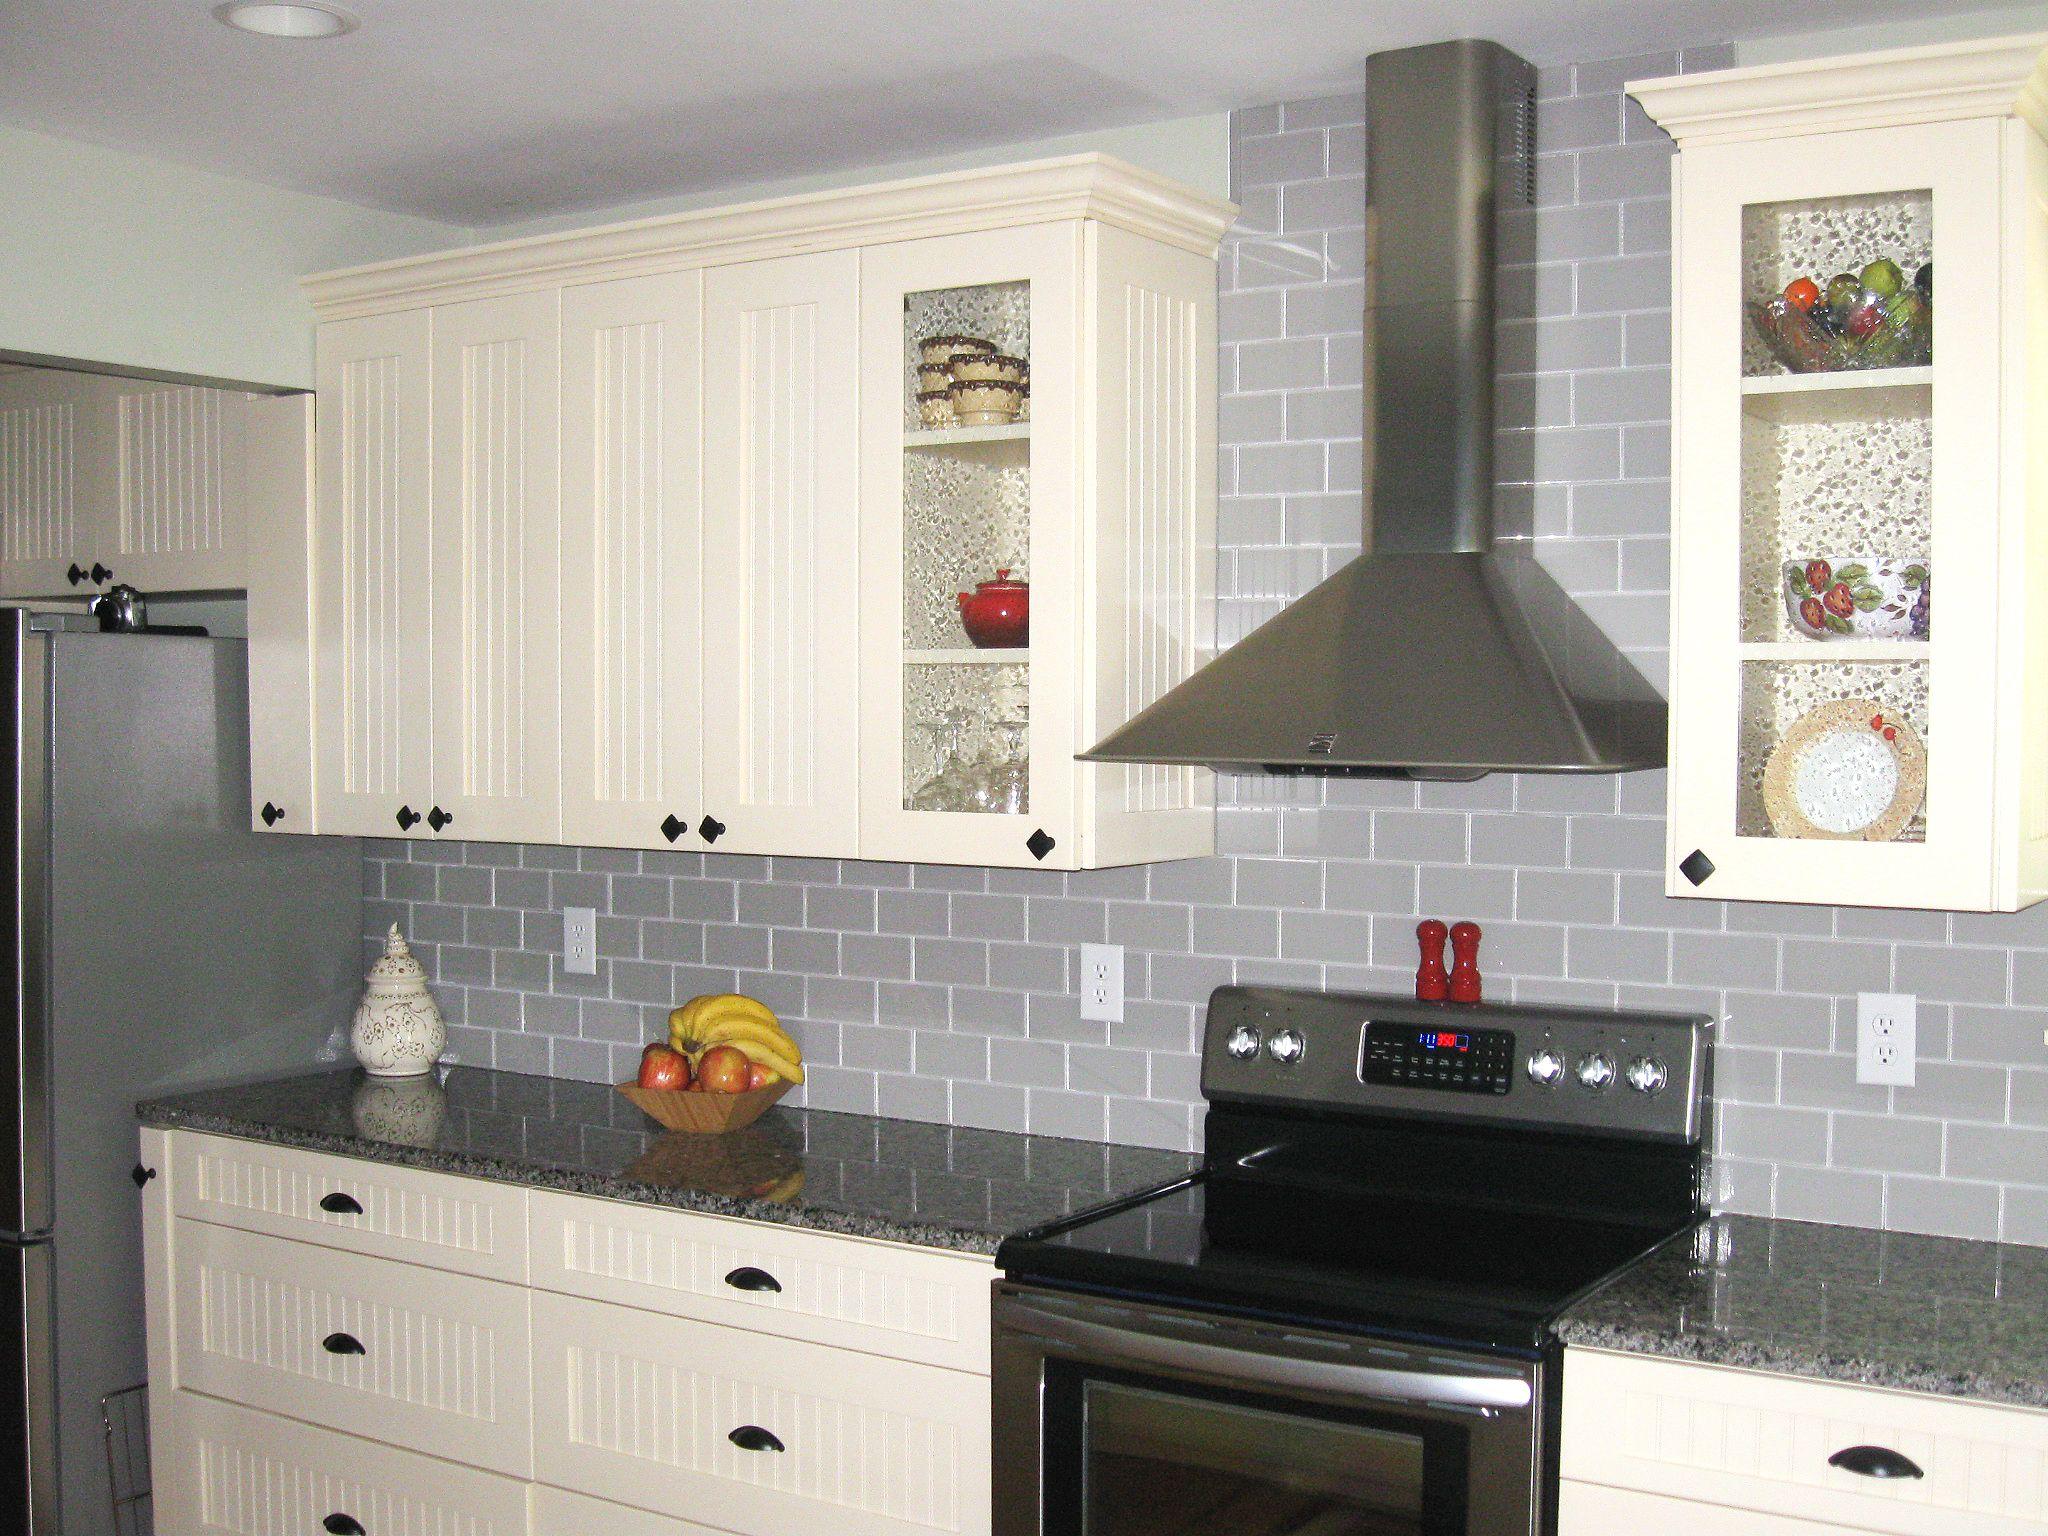 12 Subway Tile Backsplash Design Ideas Installation Tips Gray